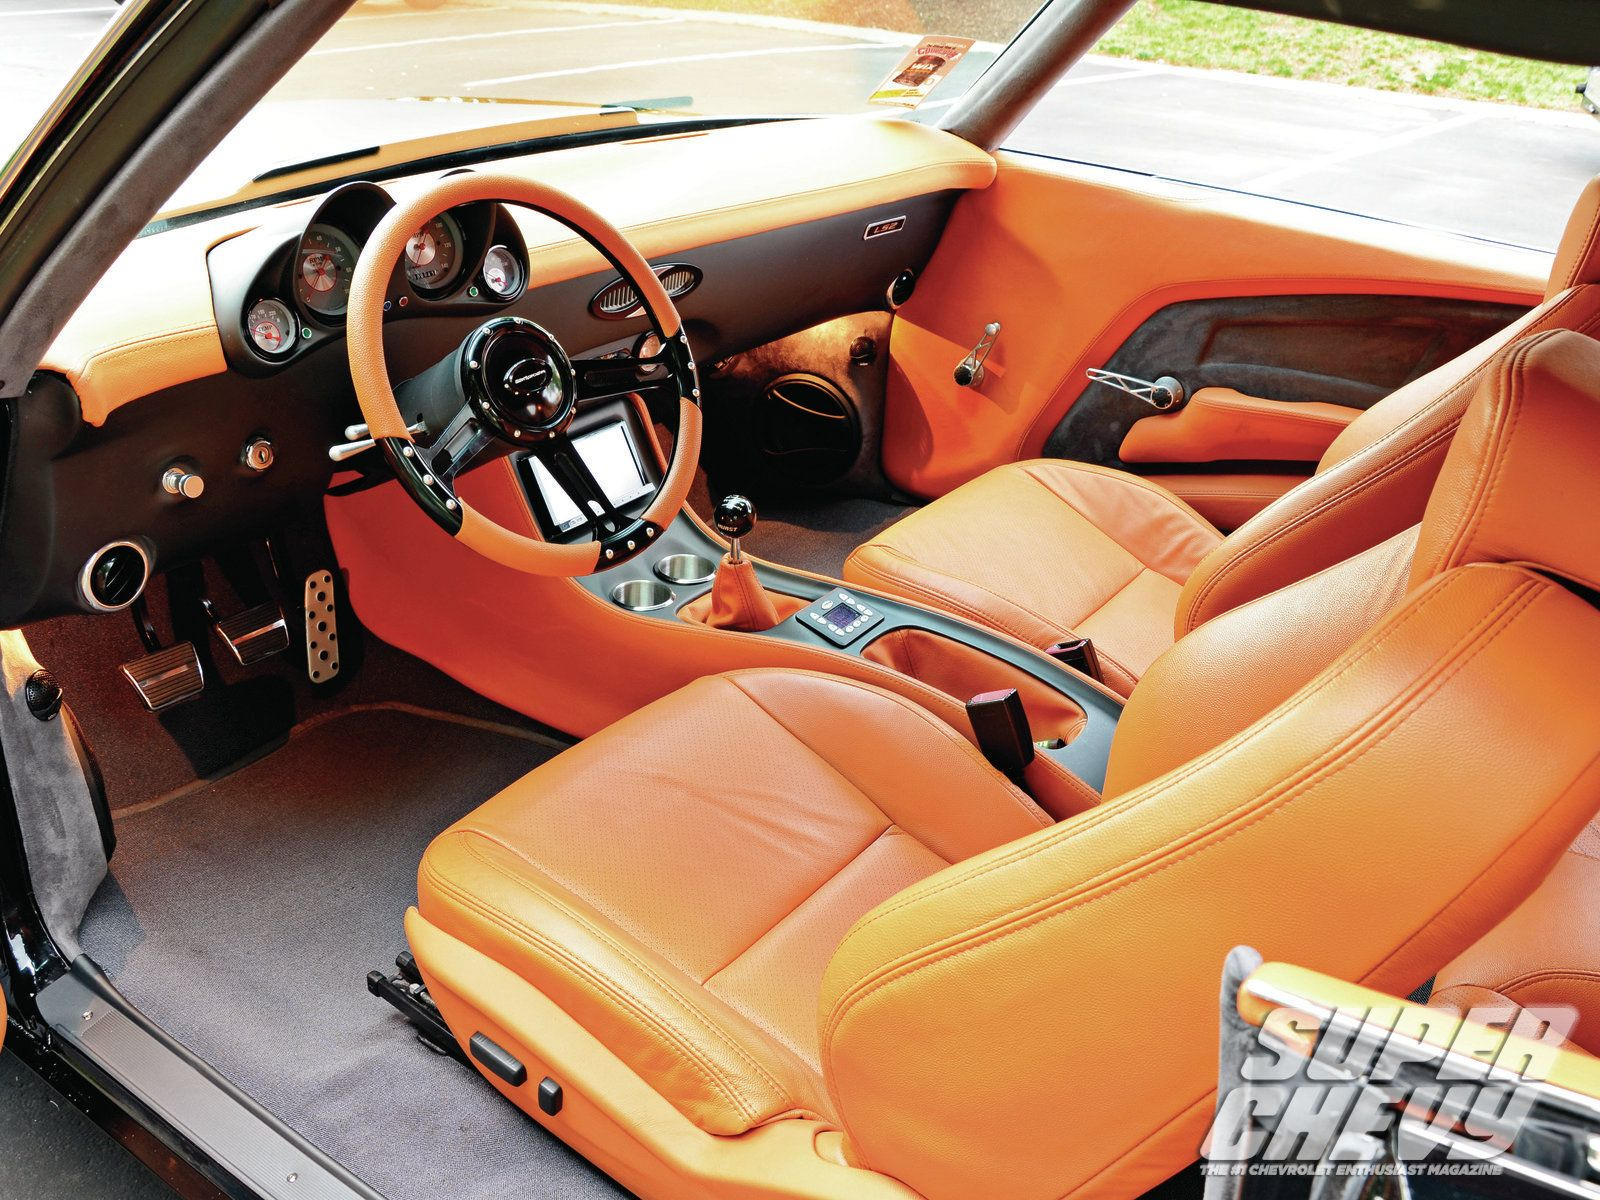 medium resolution of 1970 chevrolet chevelle ss interior photo 6 custom dash and console door panels brown orange